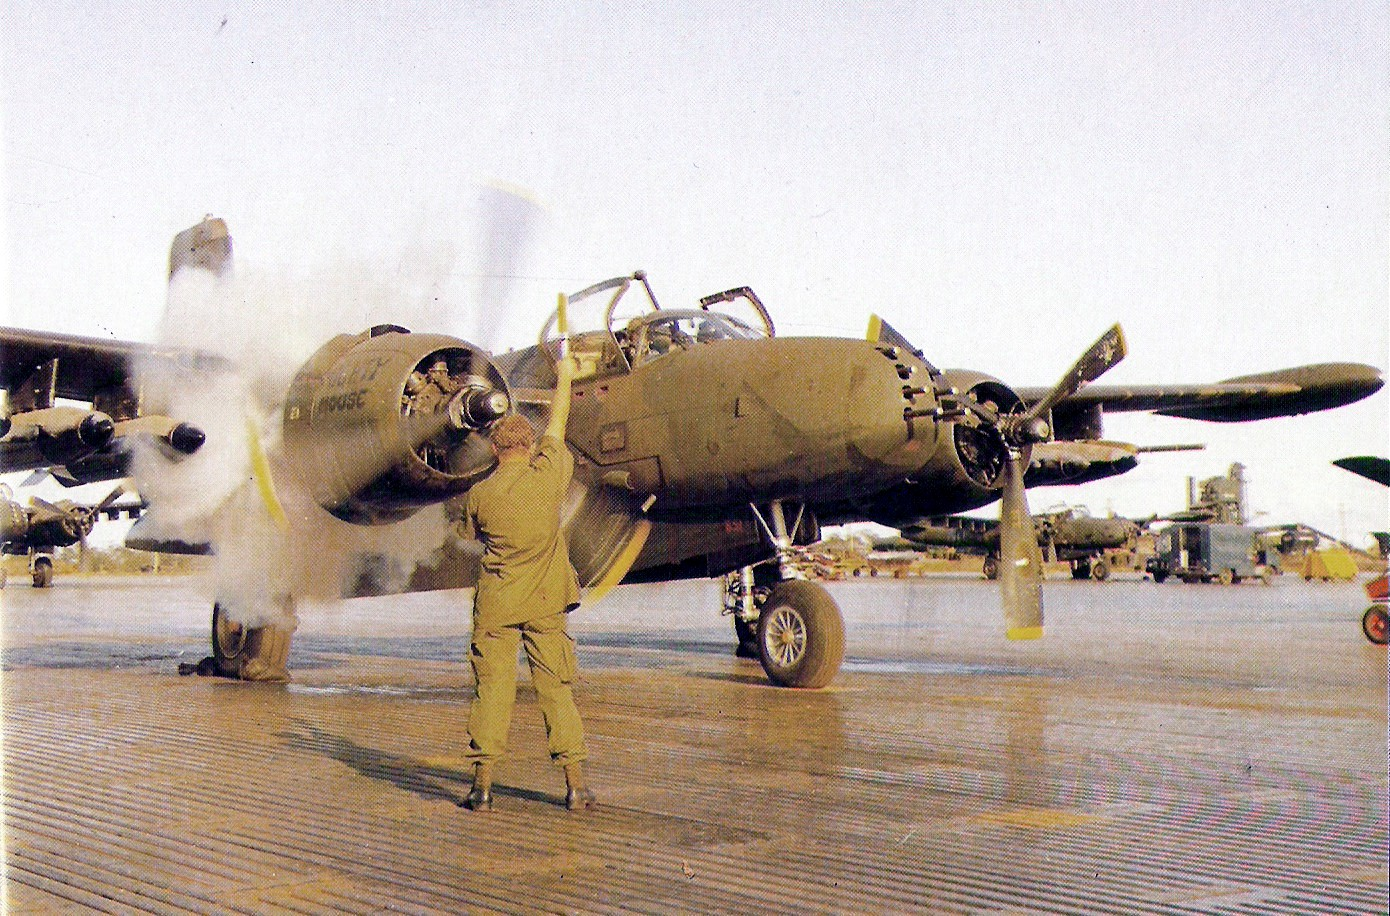 Click image for larger version  Name:B-26K_609SOS_NakhonPhanom_engine_start.jpg Views:386 Size:442.4 KB ID:2088423